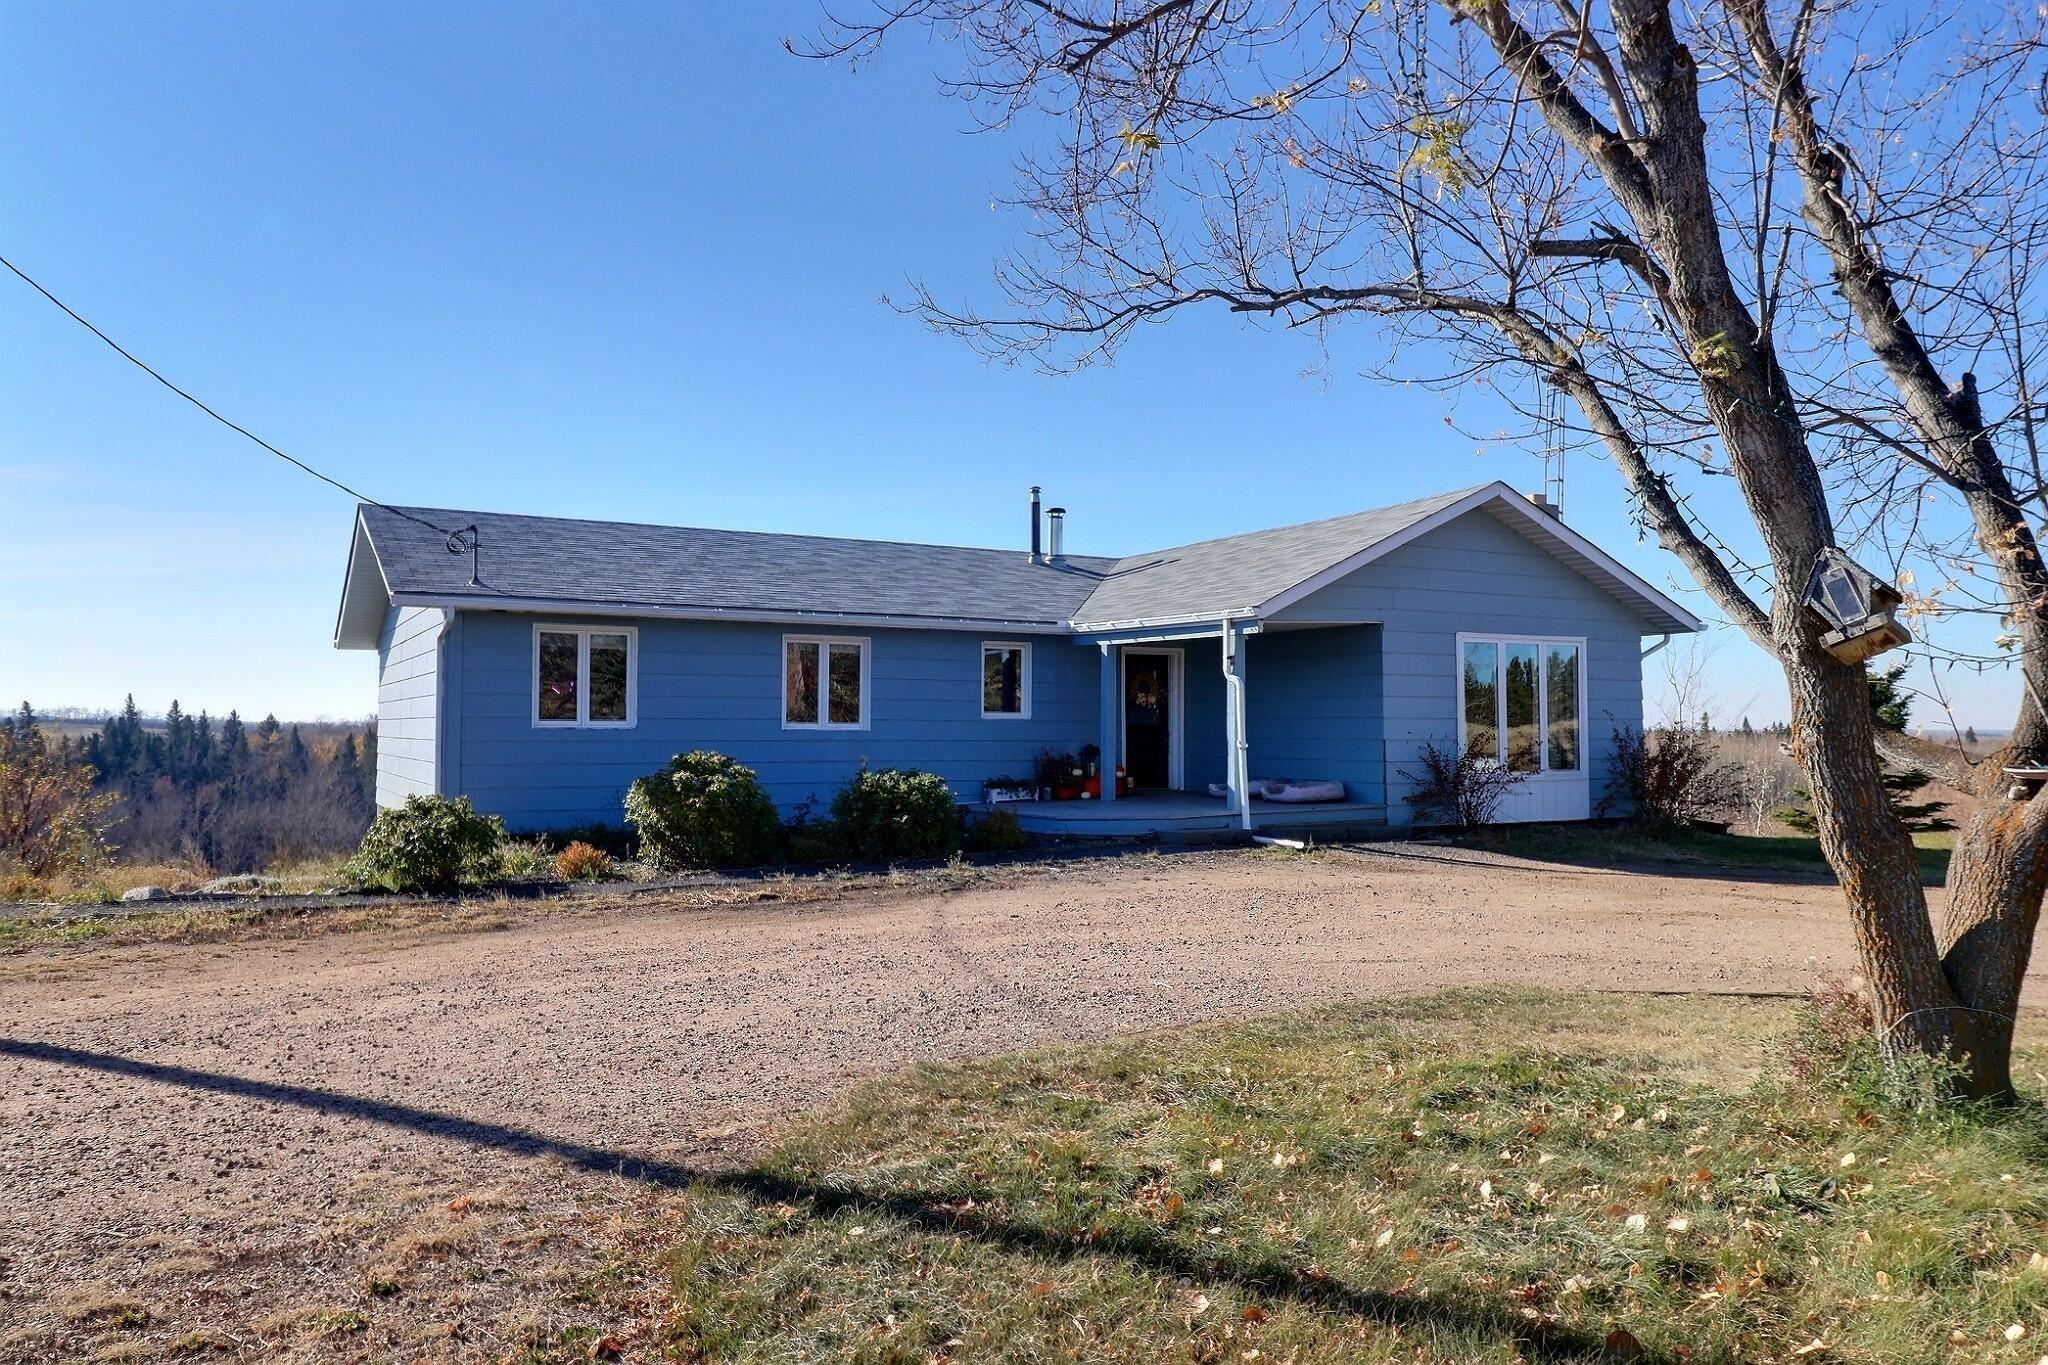 Main Photo: 58032 Range Road 85: Rural St. Paul County House for sale : MLS®# E4266539